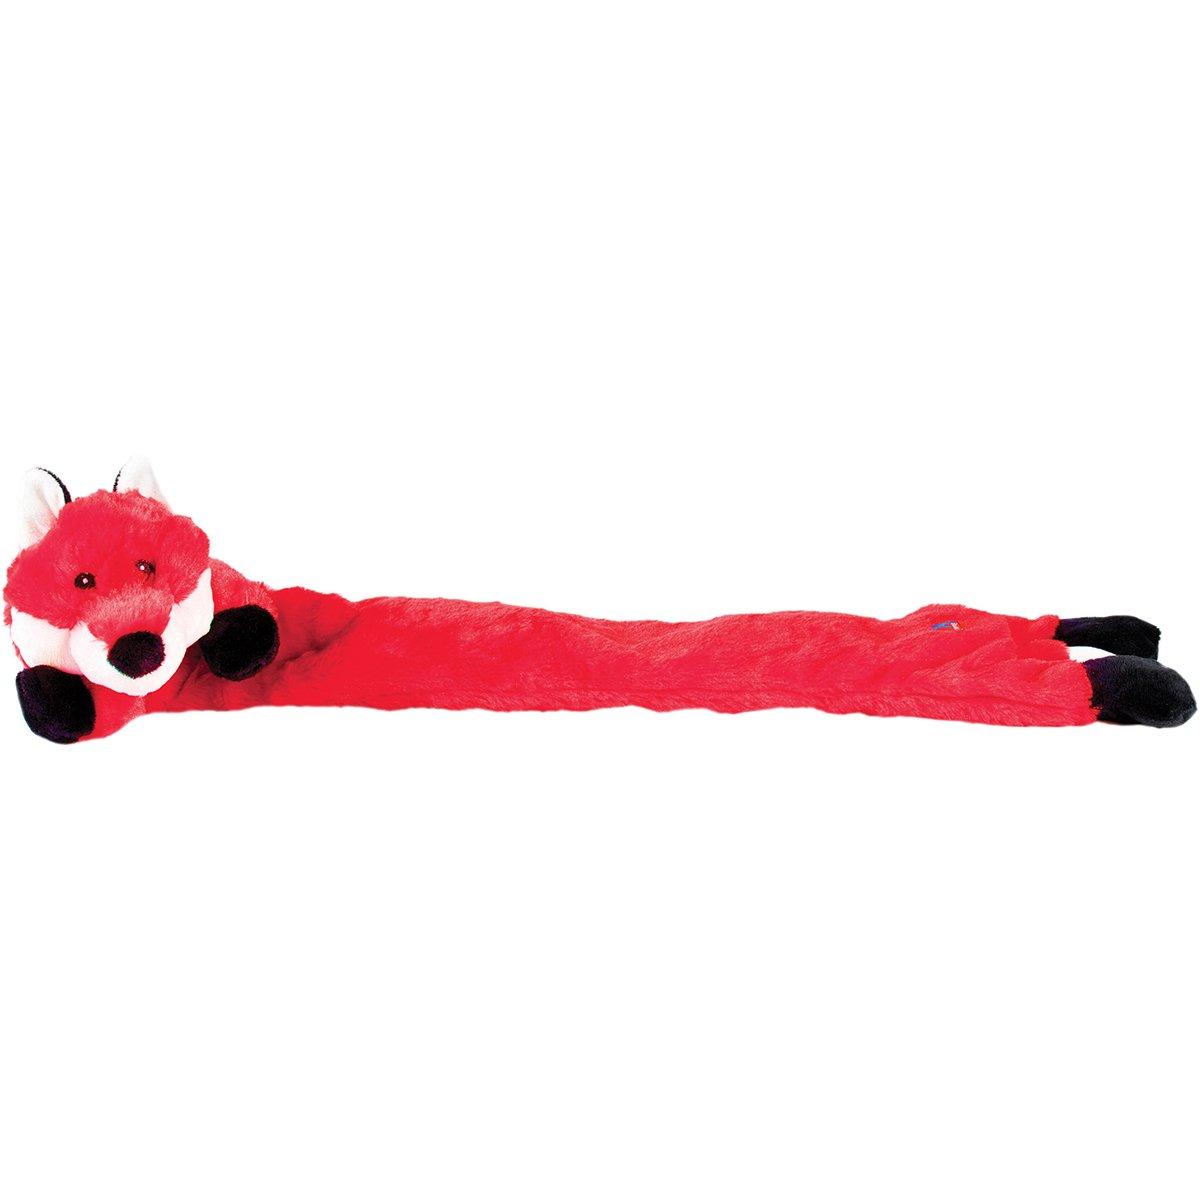 Charming Pet Longidudes Pet Squeak Toy, Fox